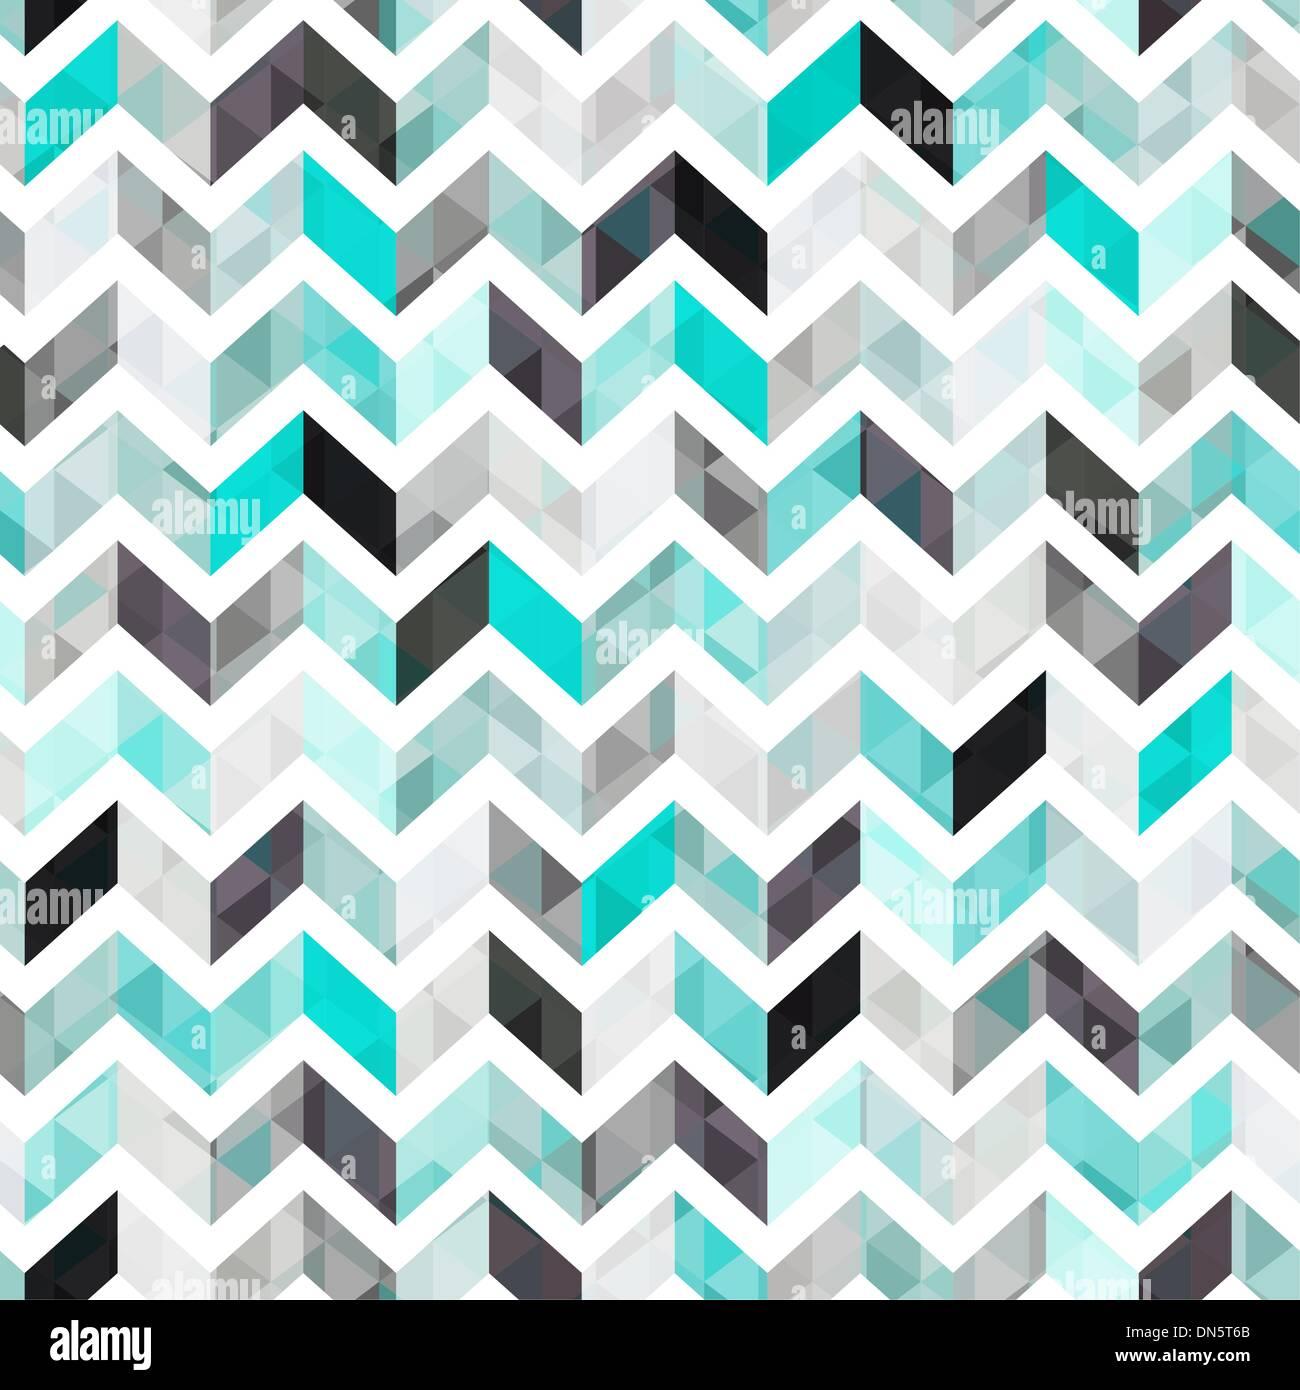 Antecedentes vectoriales textura geométrica perfecta Imagen De Stock